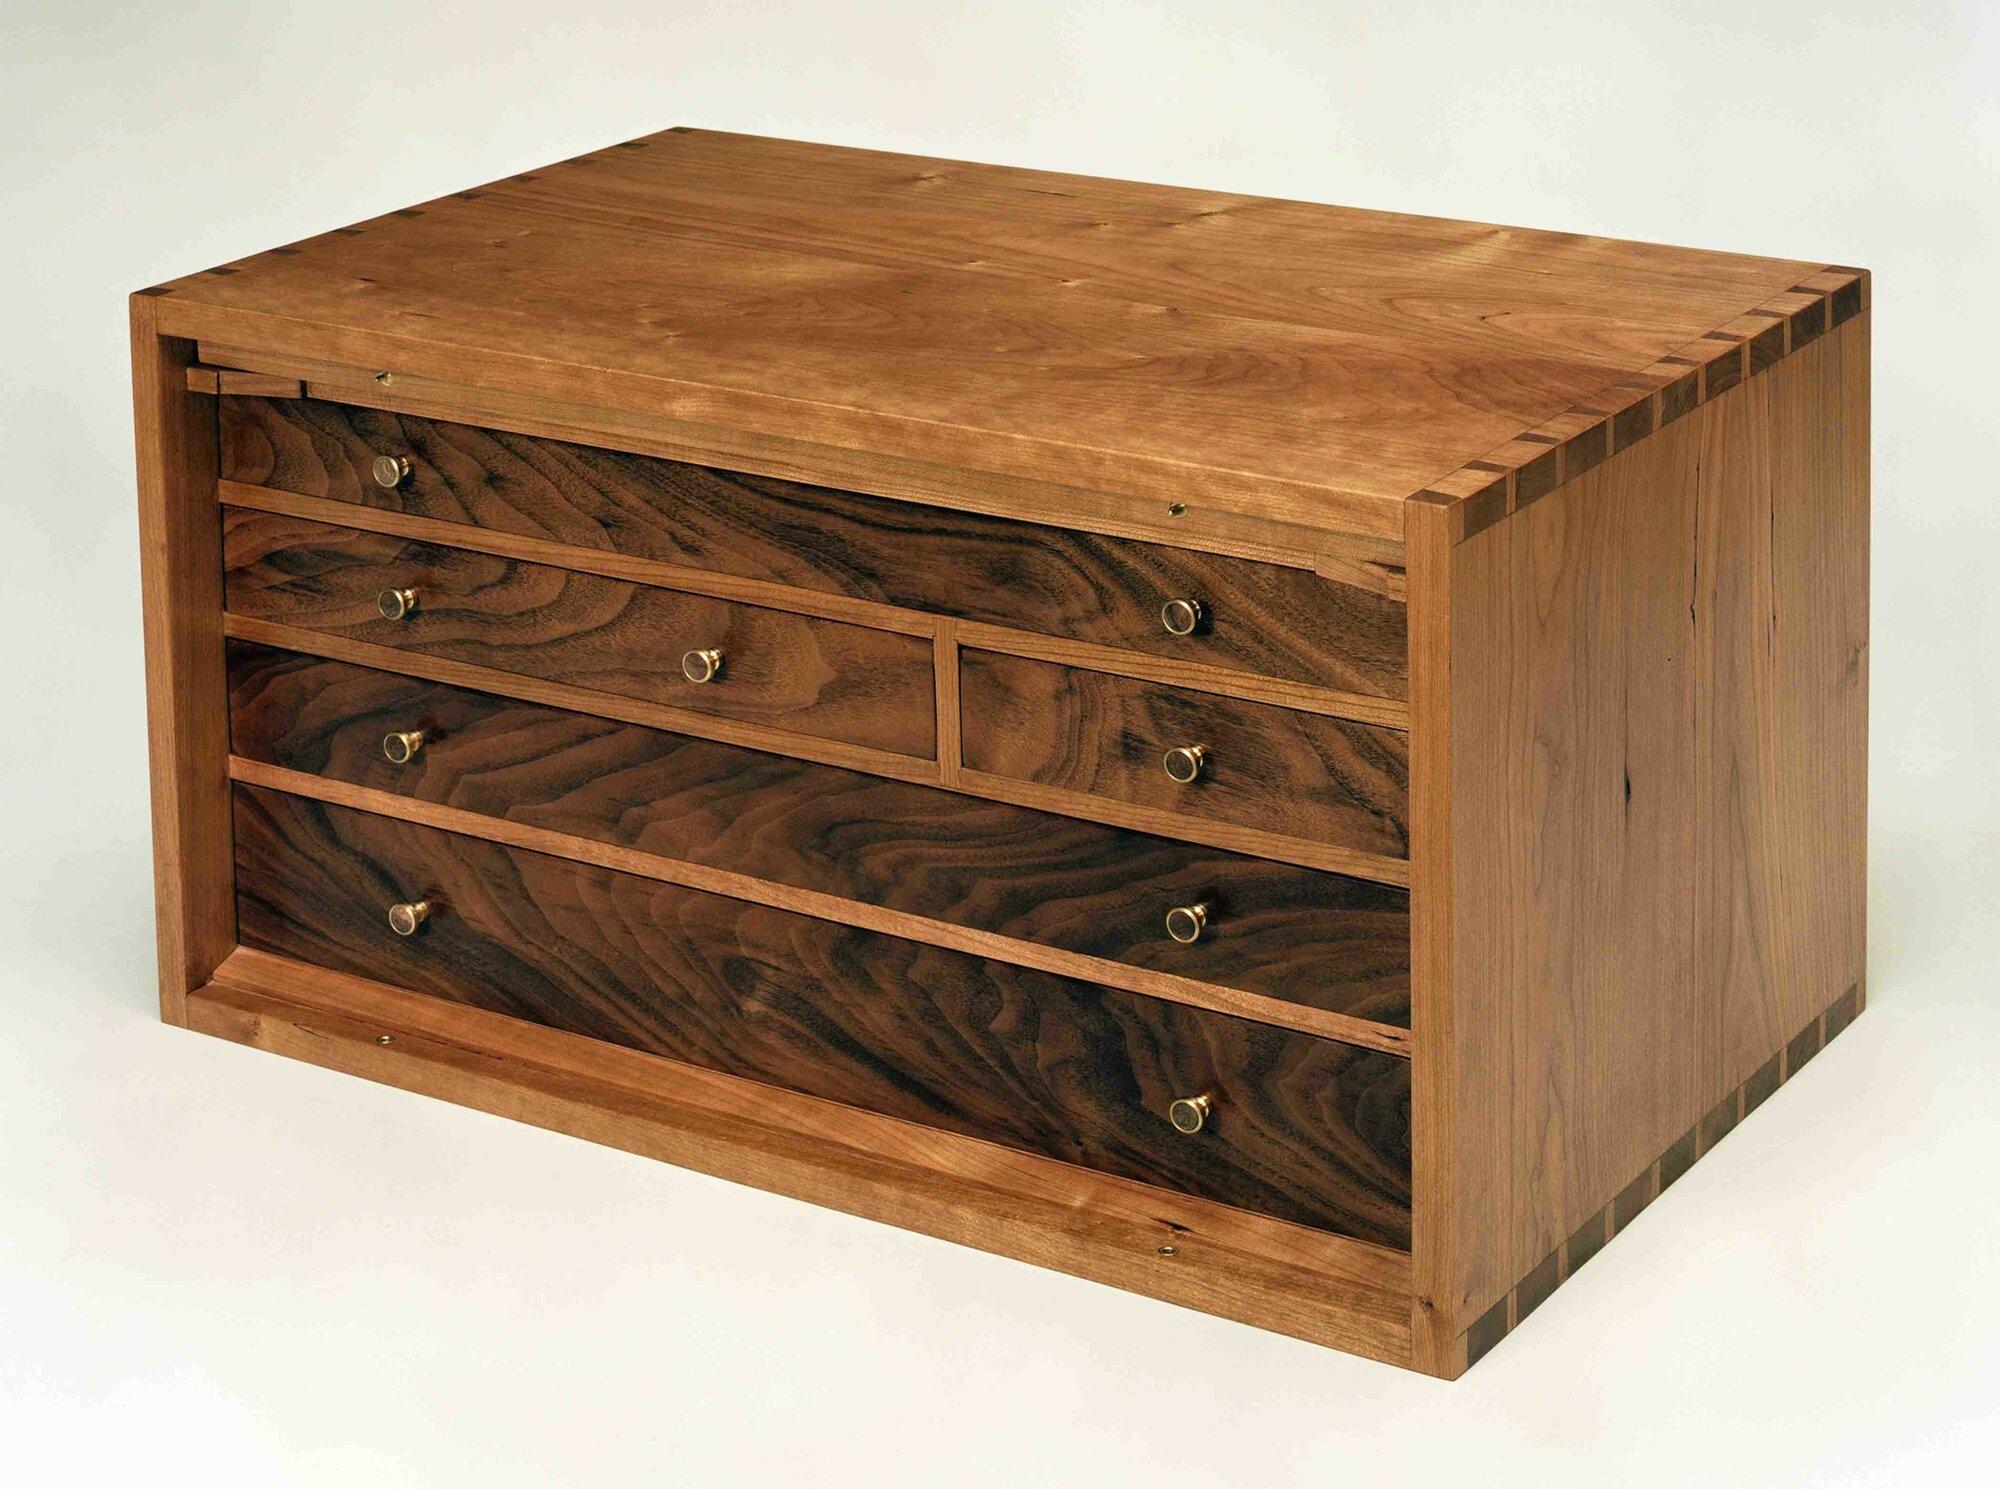 NBSS tool chest